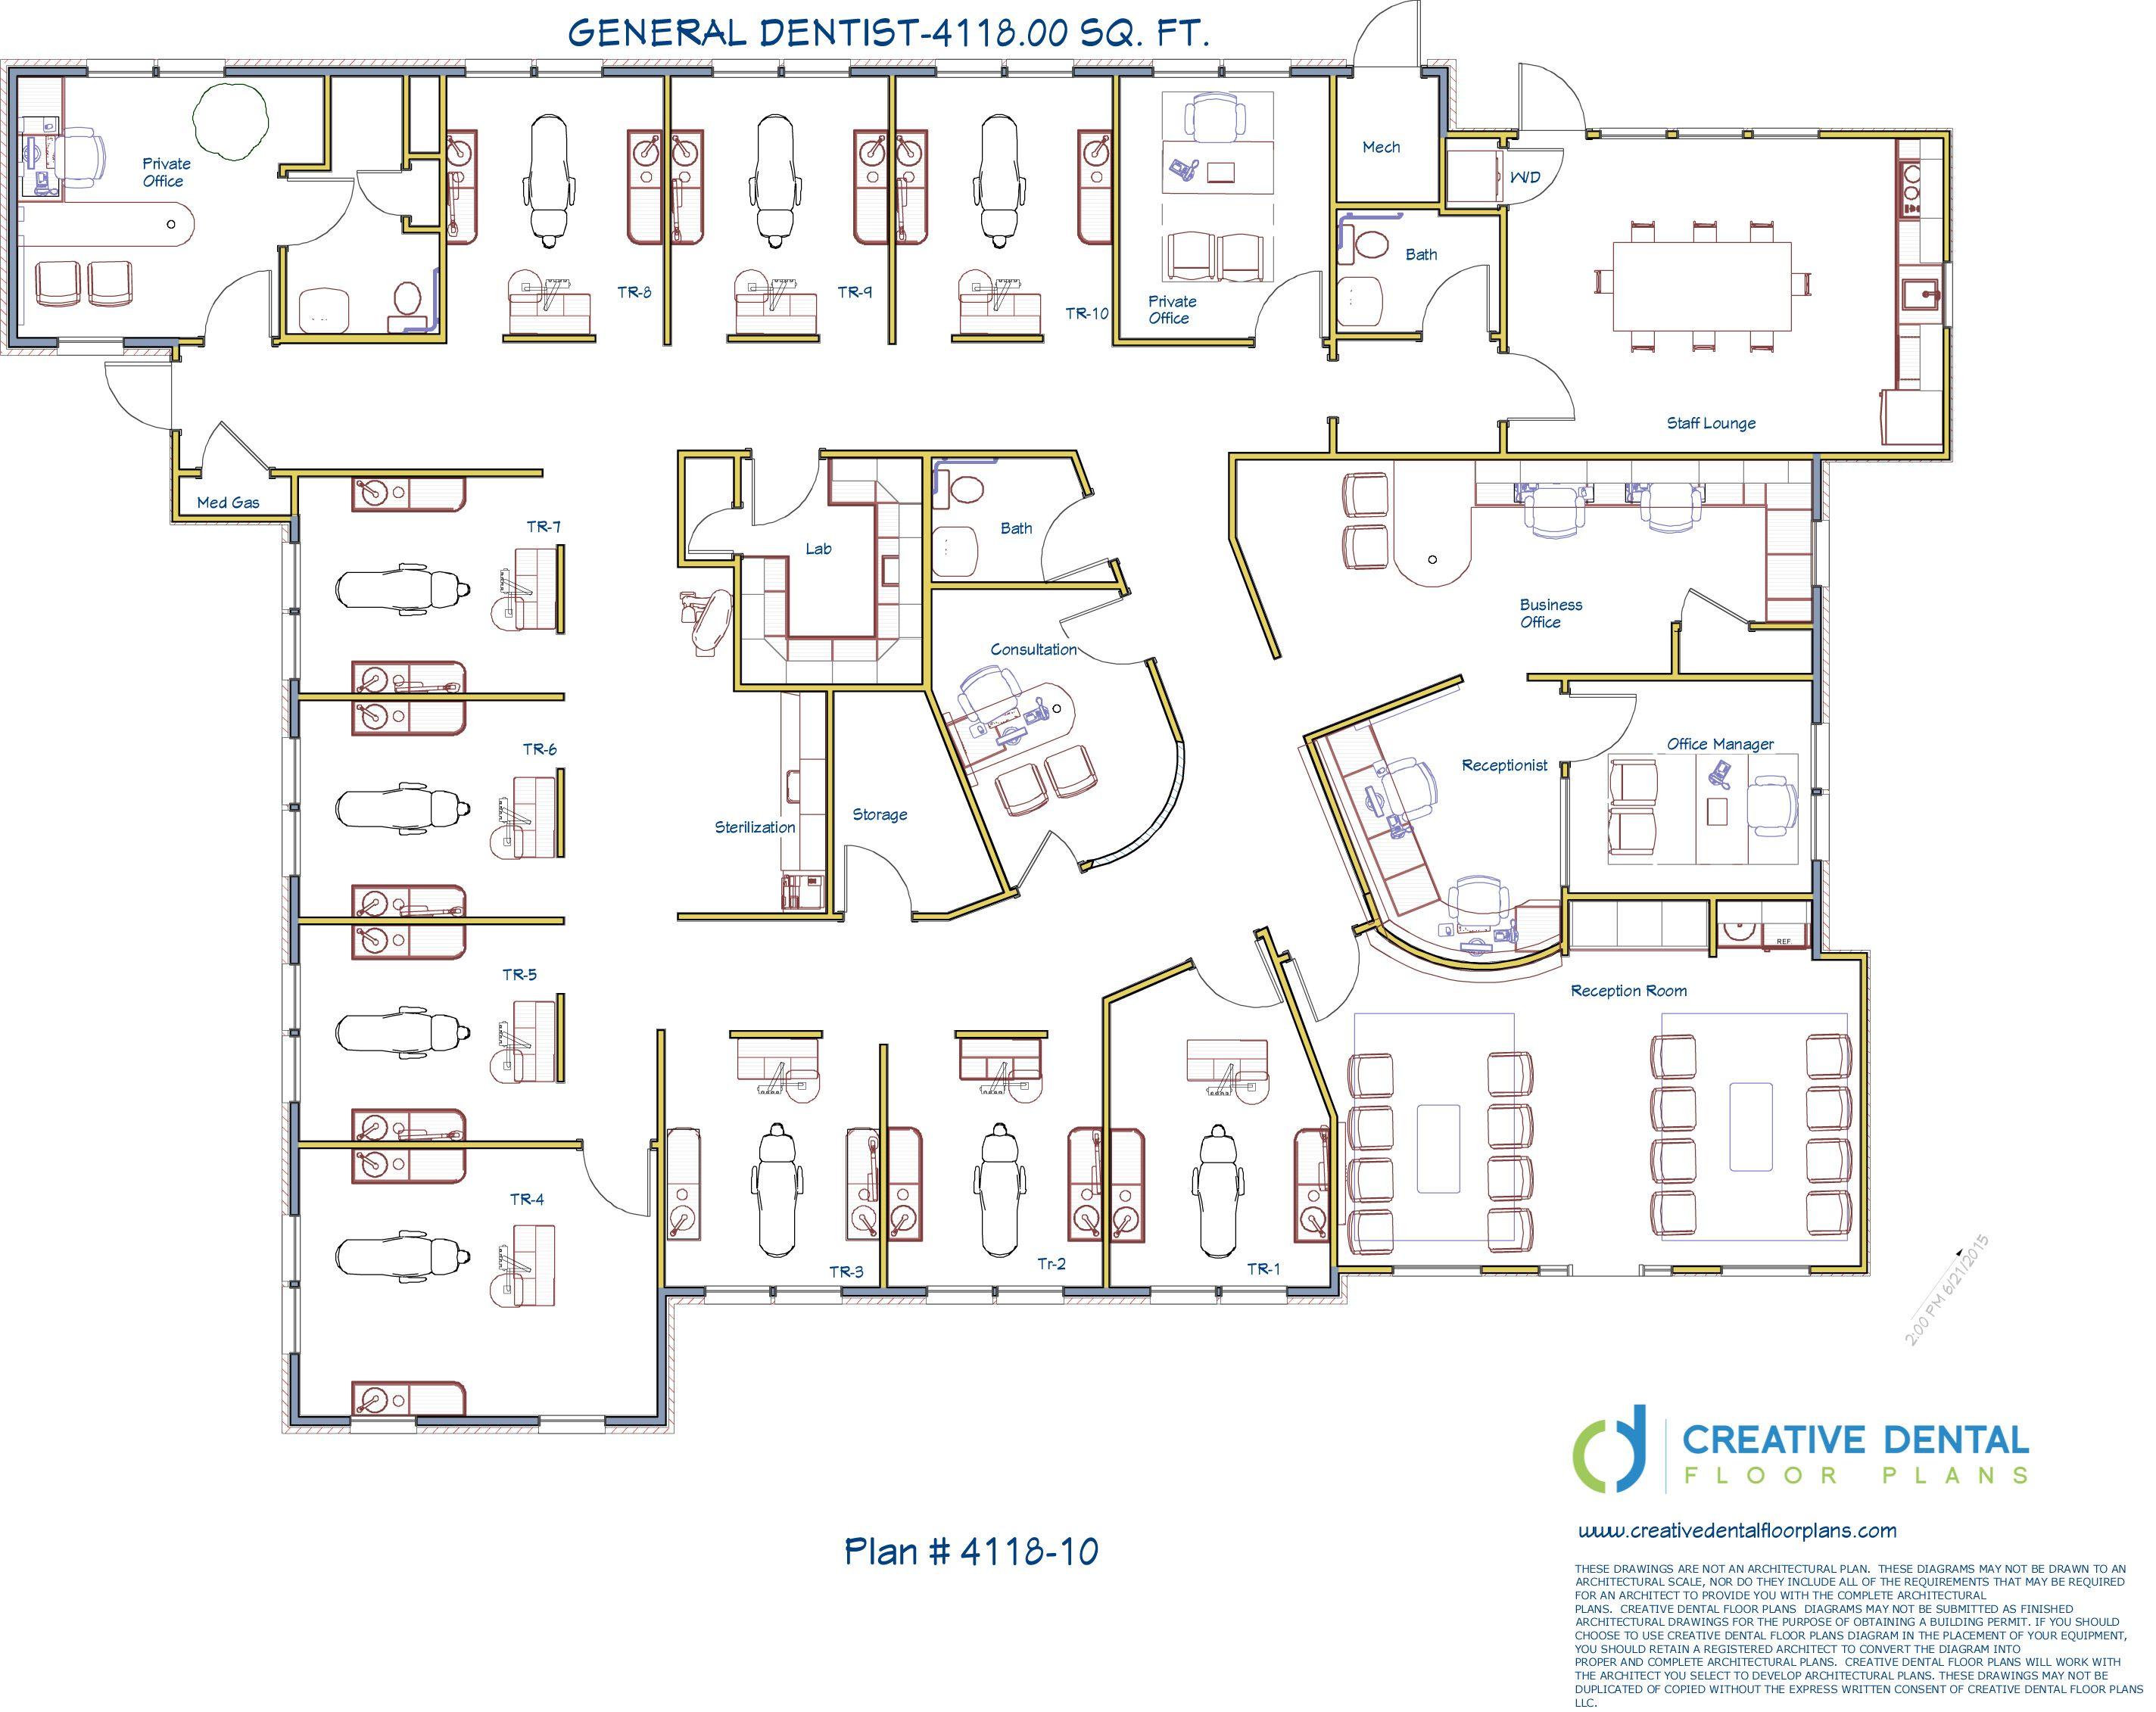 2 D Floor Plans For Dental Office Floor Plans Office Floor Plan Medical Clinic Design